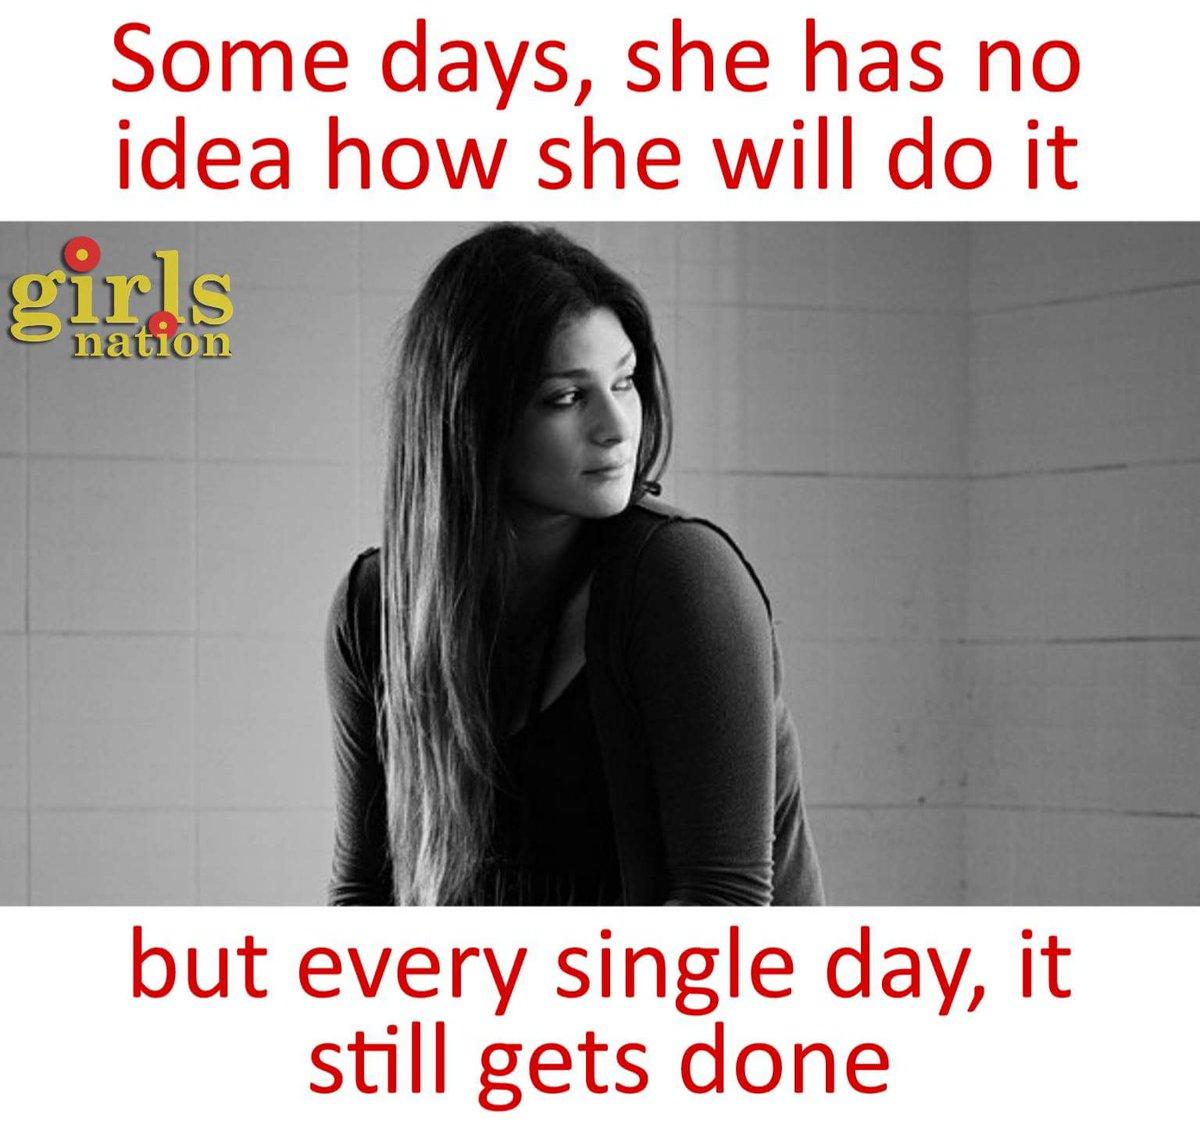 RT @GirlsNation_In: Because she is strong!! #SundayMotivation https://t.co/9TTU1RGEaX